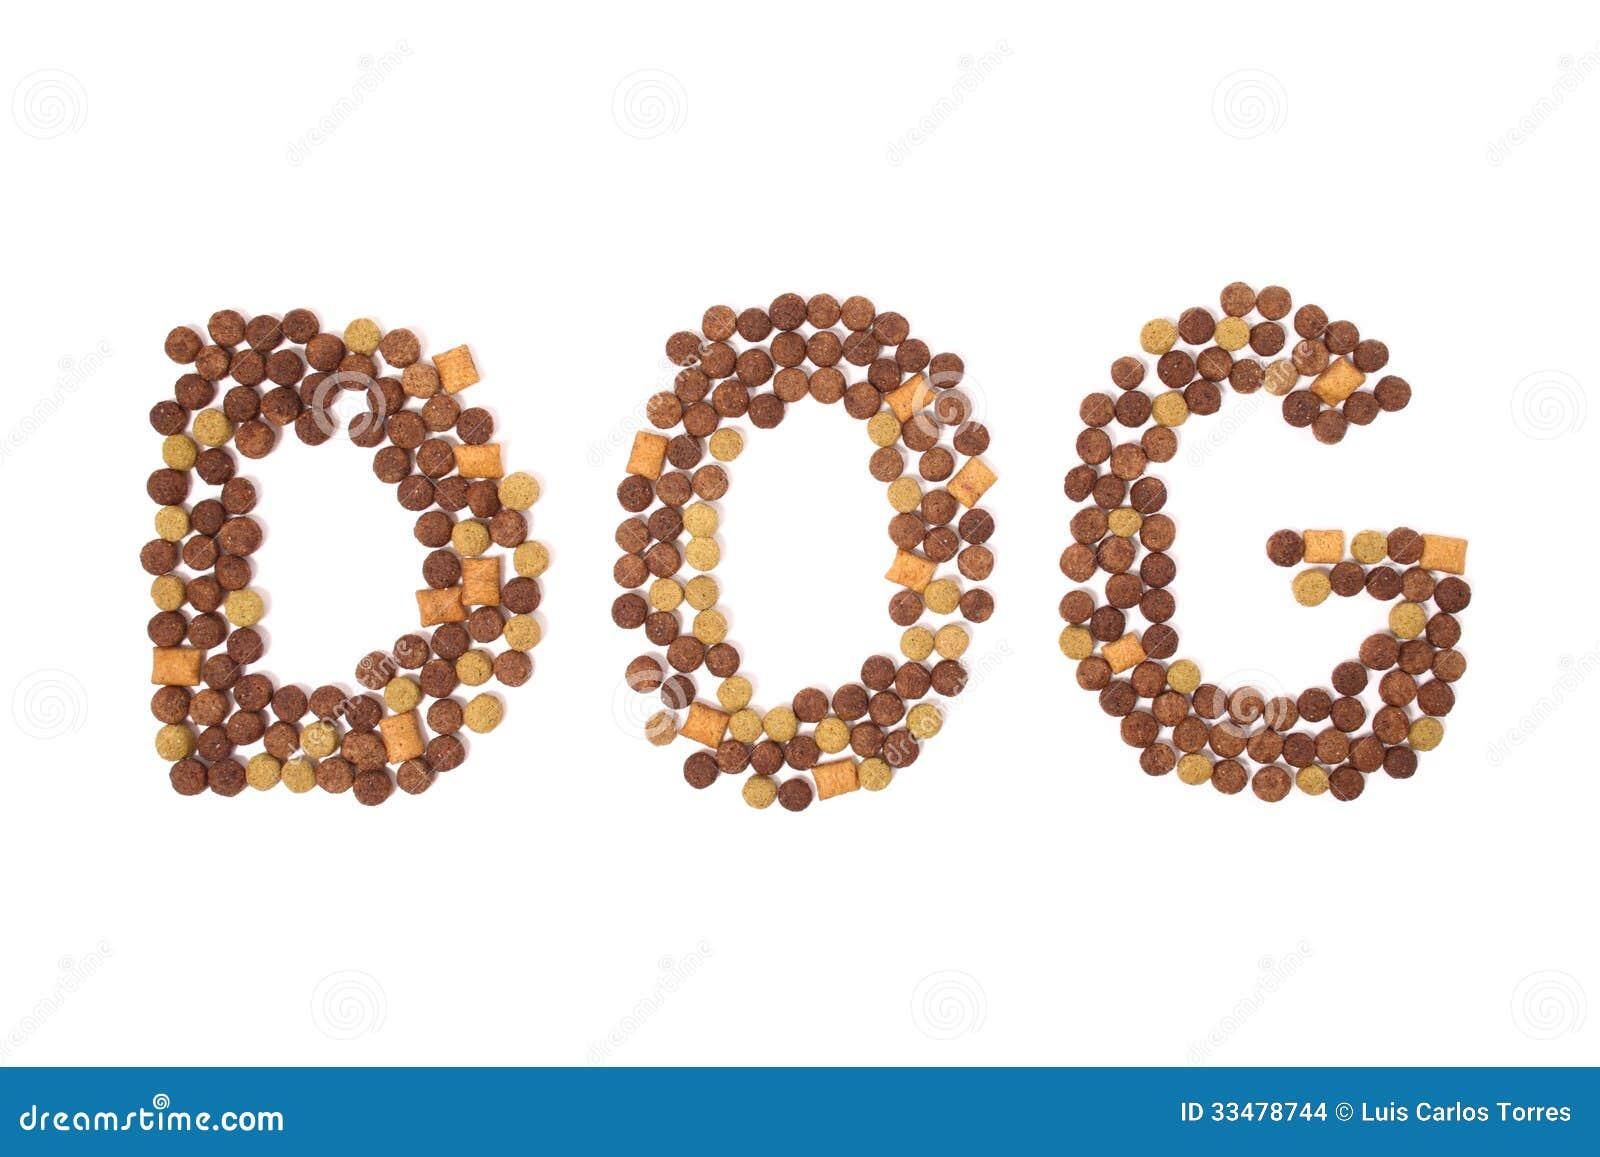 M And S Dog Food